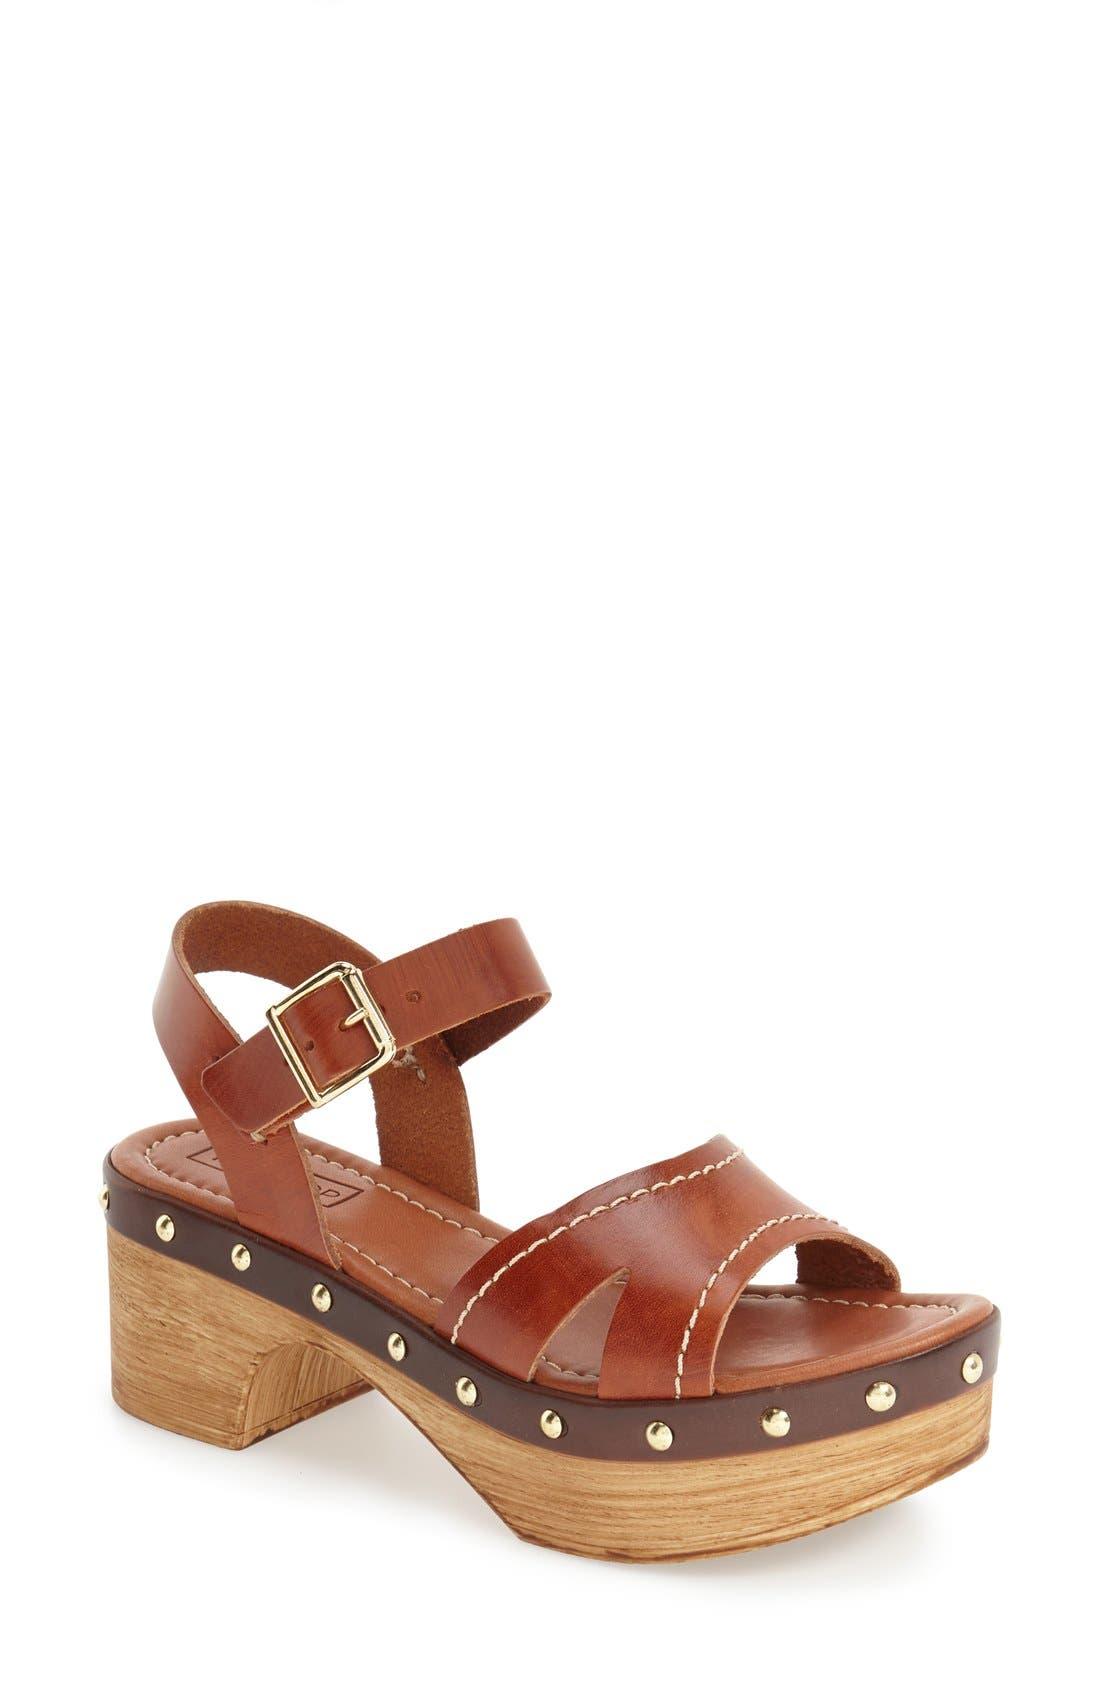 'VIV' Clog Sandals,                         Main,                         color, Tan